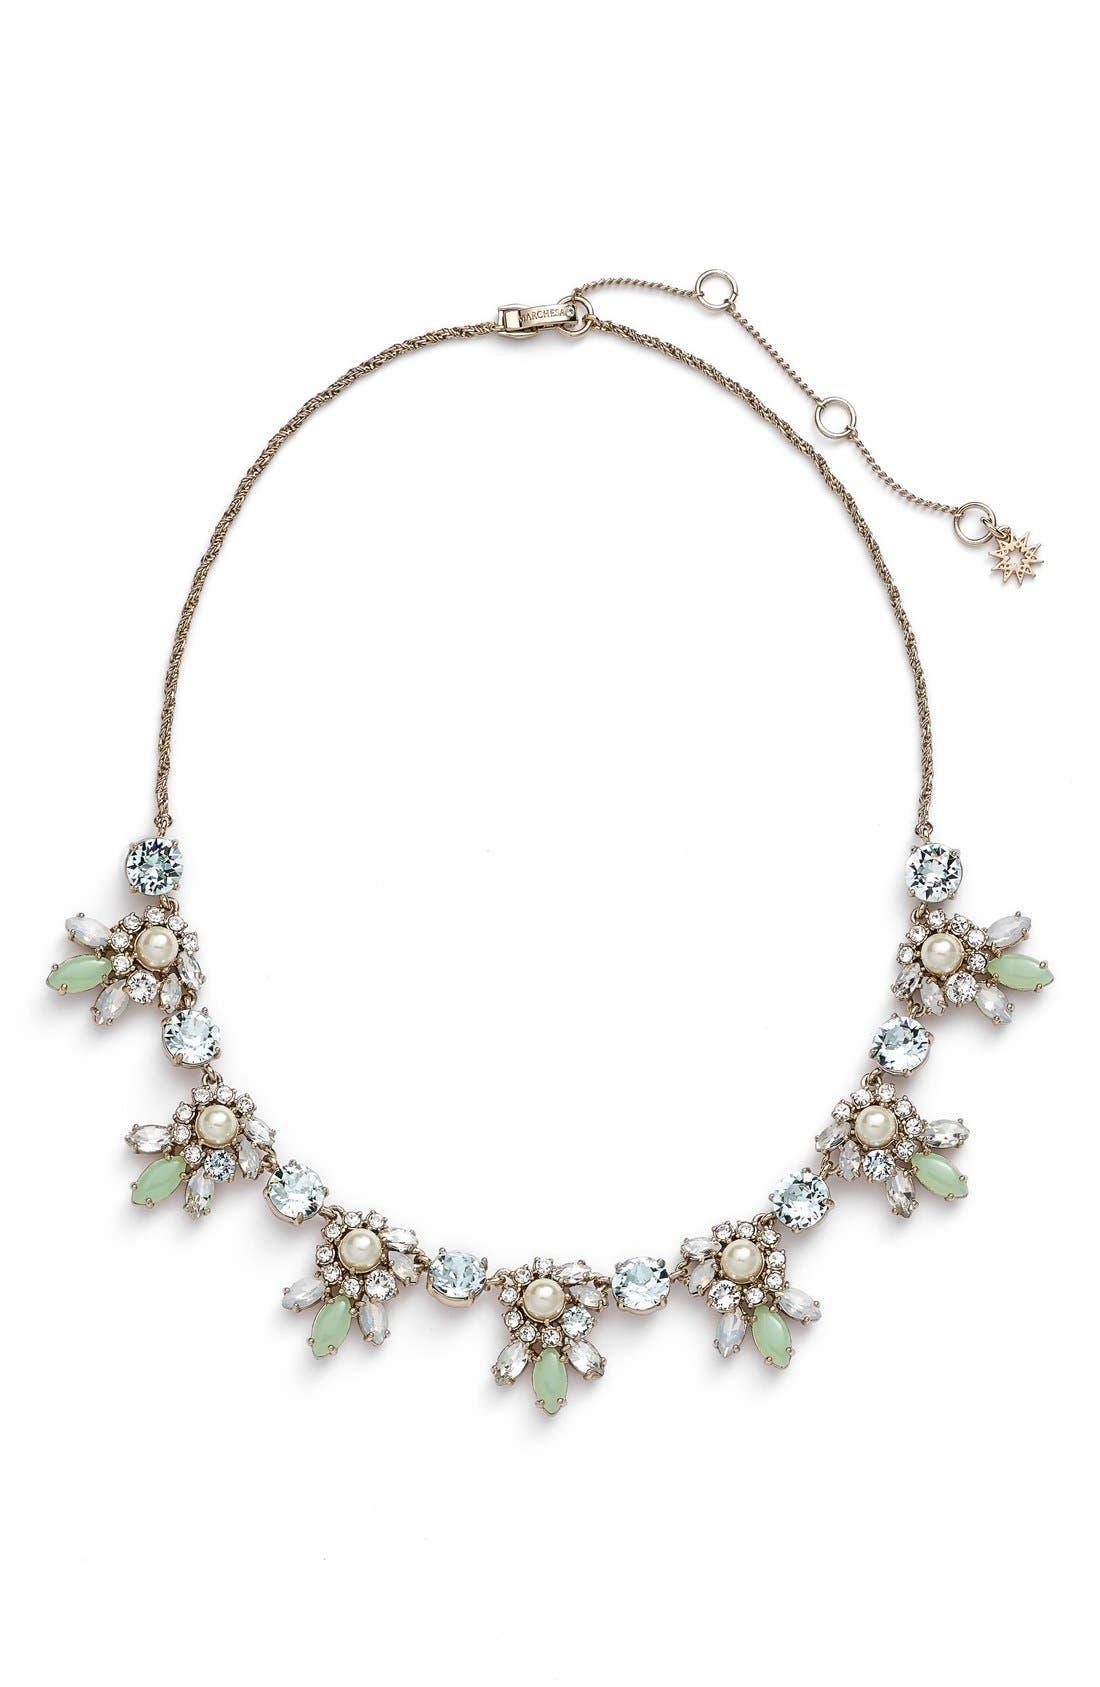 Main Image - Marchesa Crystal Cluster Bib Necklace